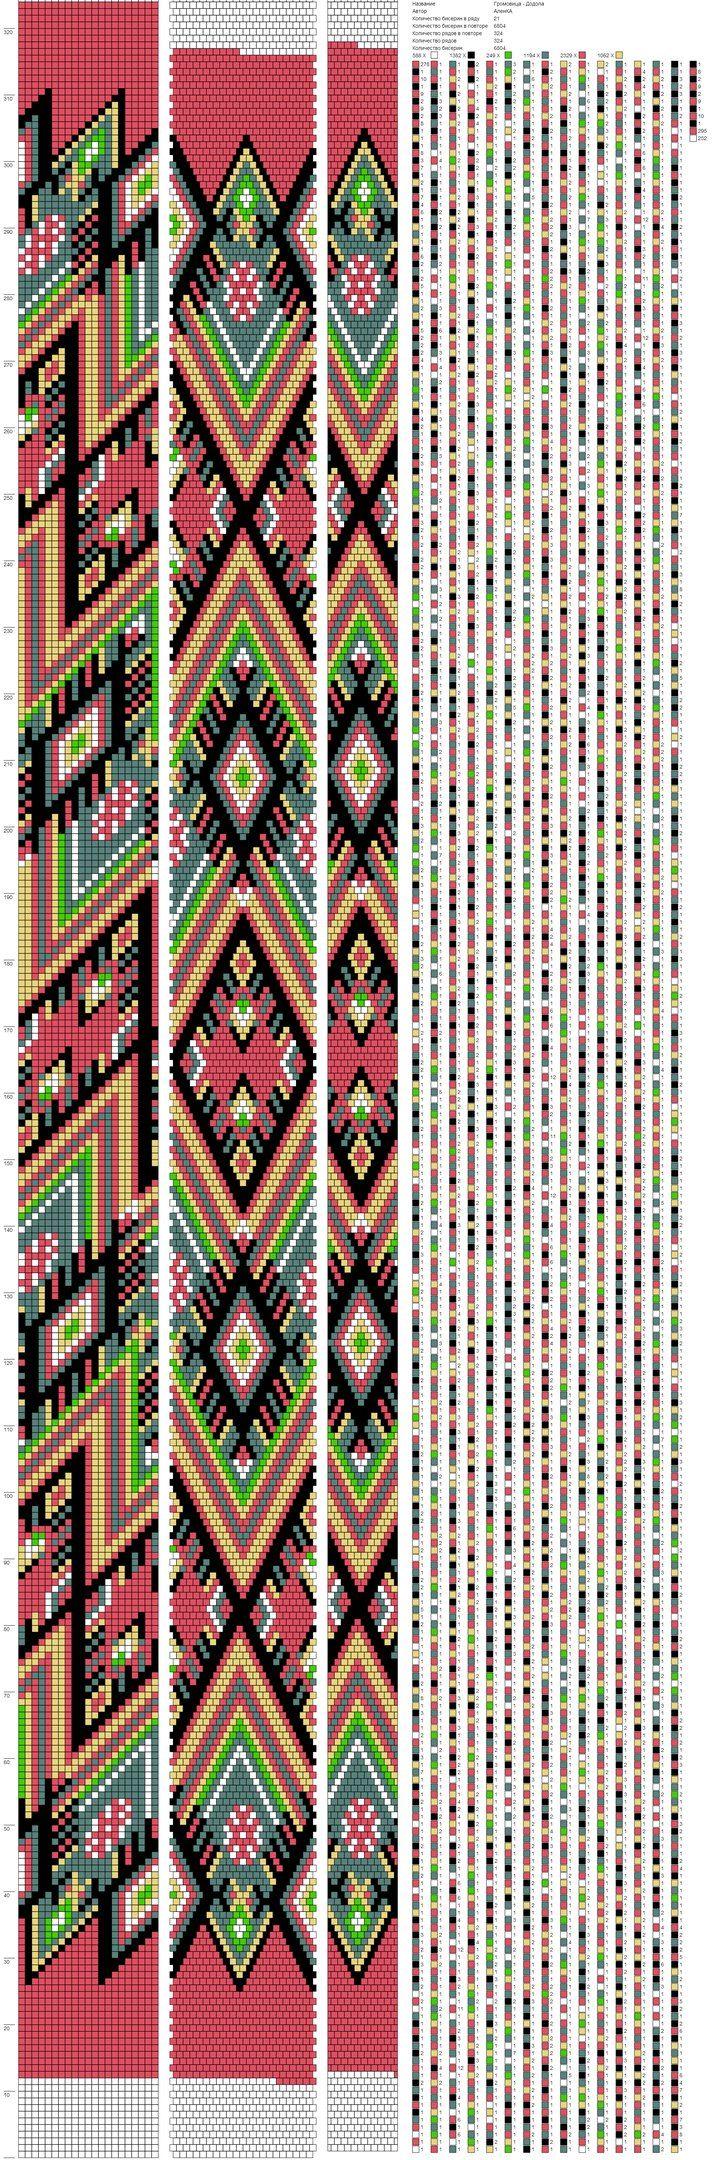 GEVsR6gLNsI.jpg (715×2160)